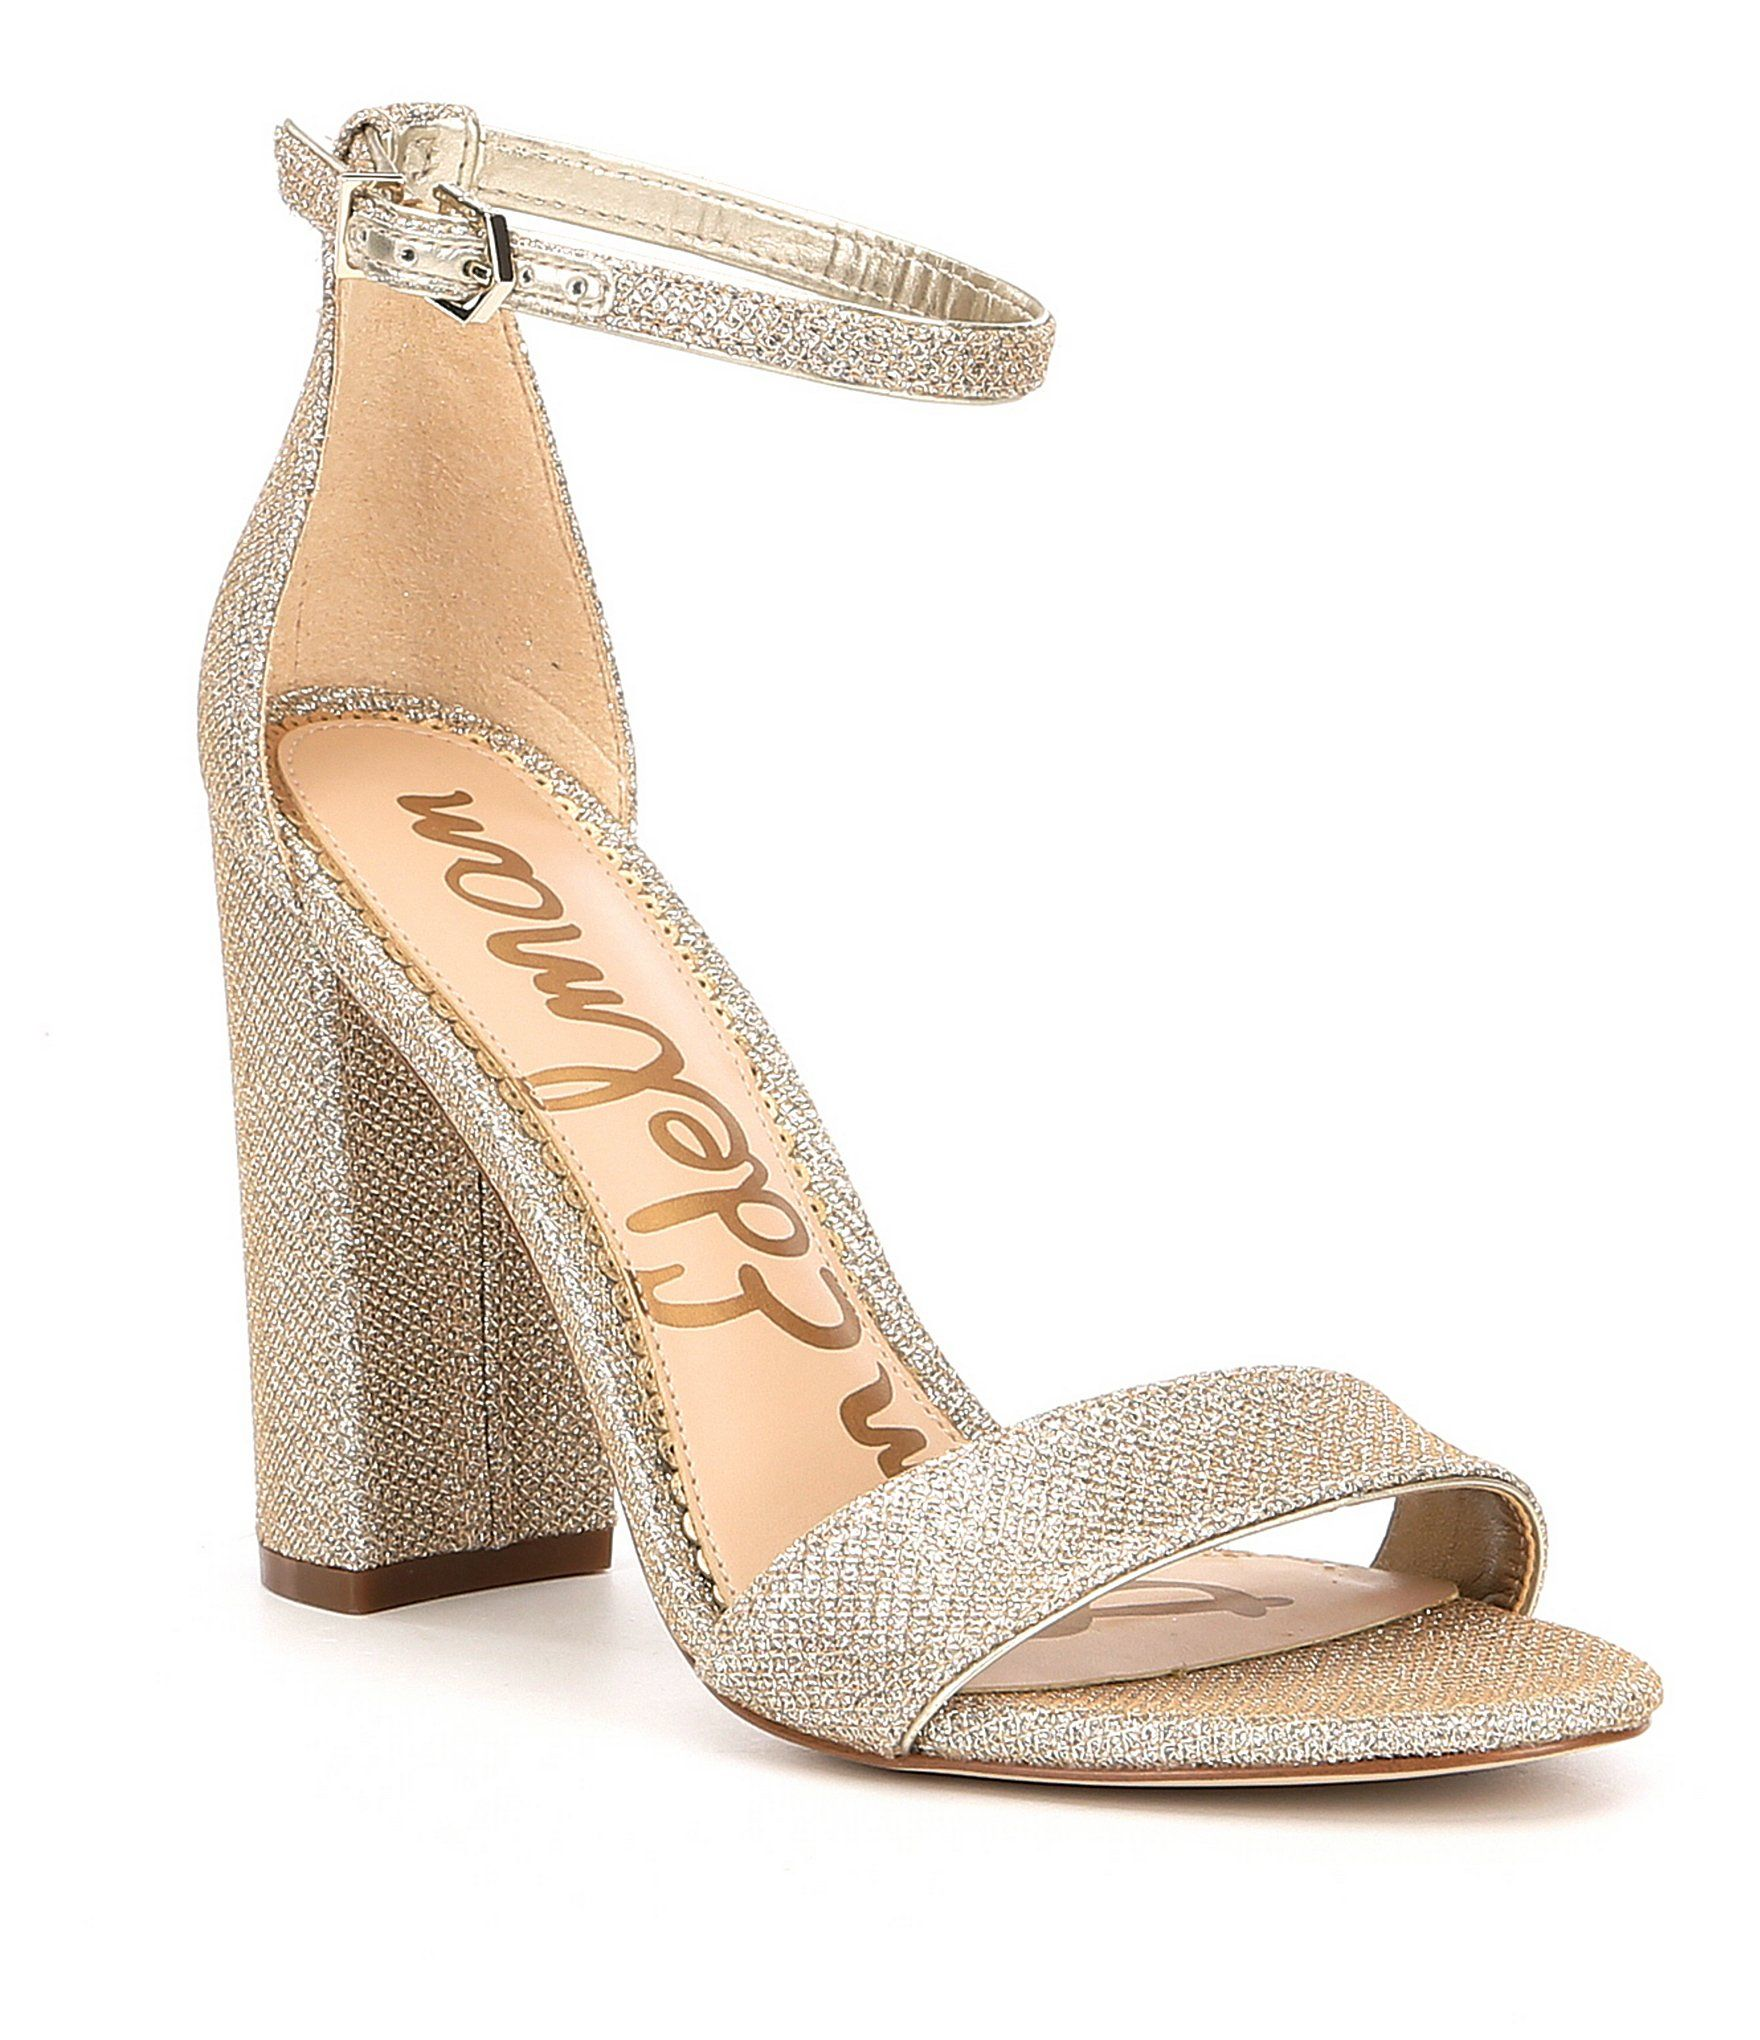 Sam Edelman Yaro Metallic Sequin Block Heel Dress Sandal 6yWdaPprnS